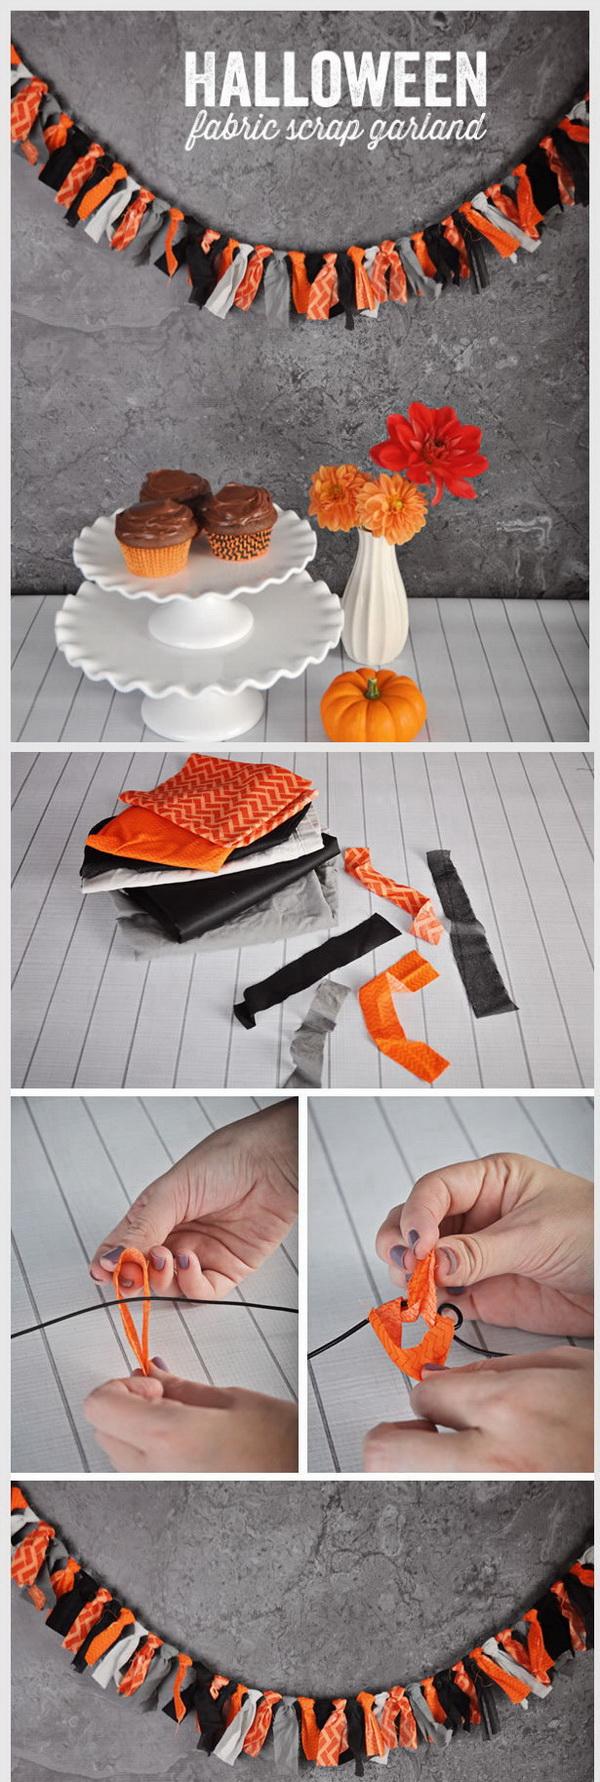 DIY Halloween Decorating Projects: DIY Halloween Fabric Scrap Garland.